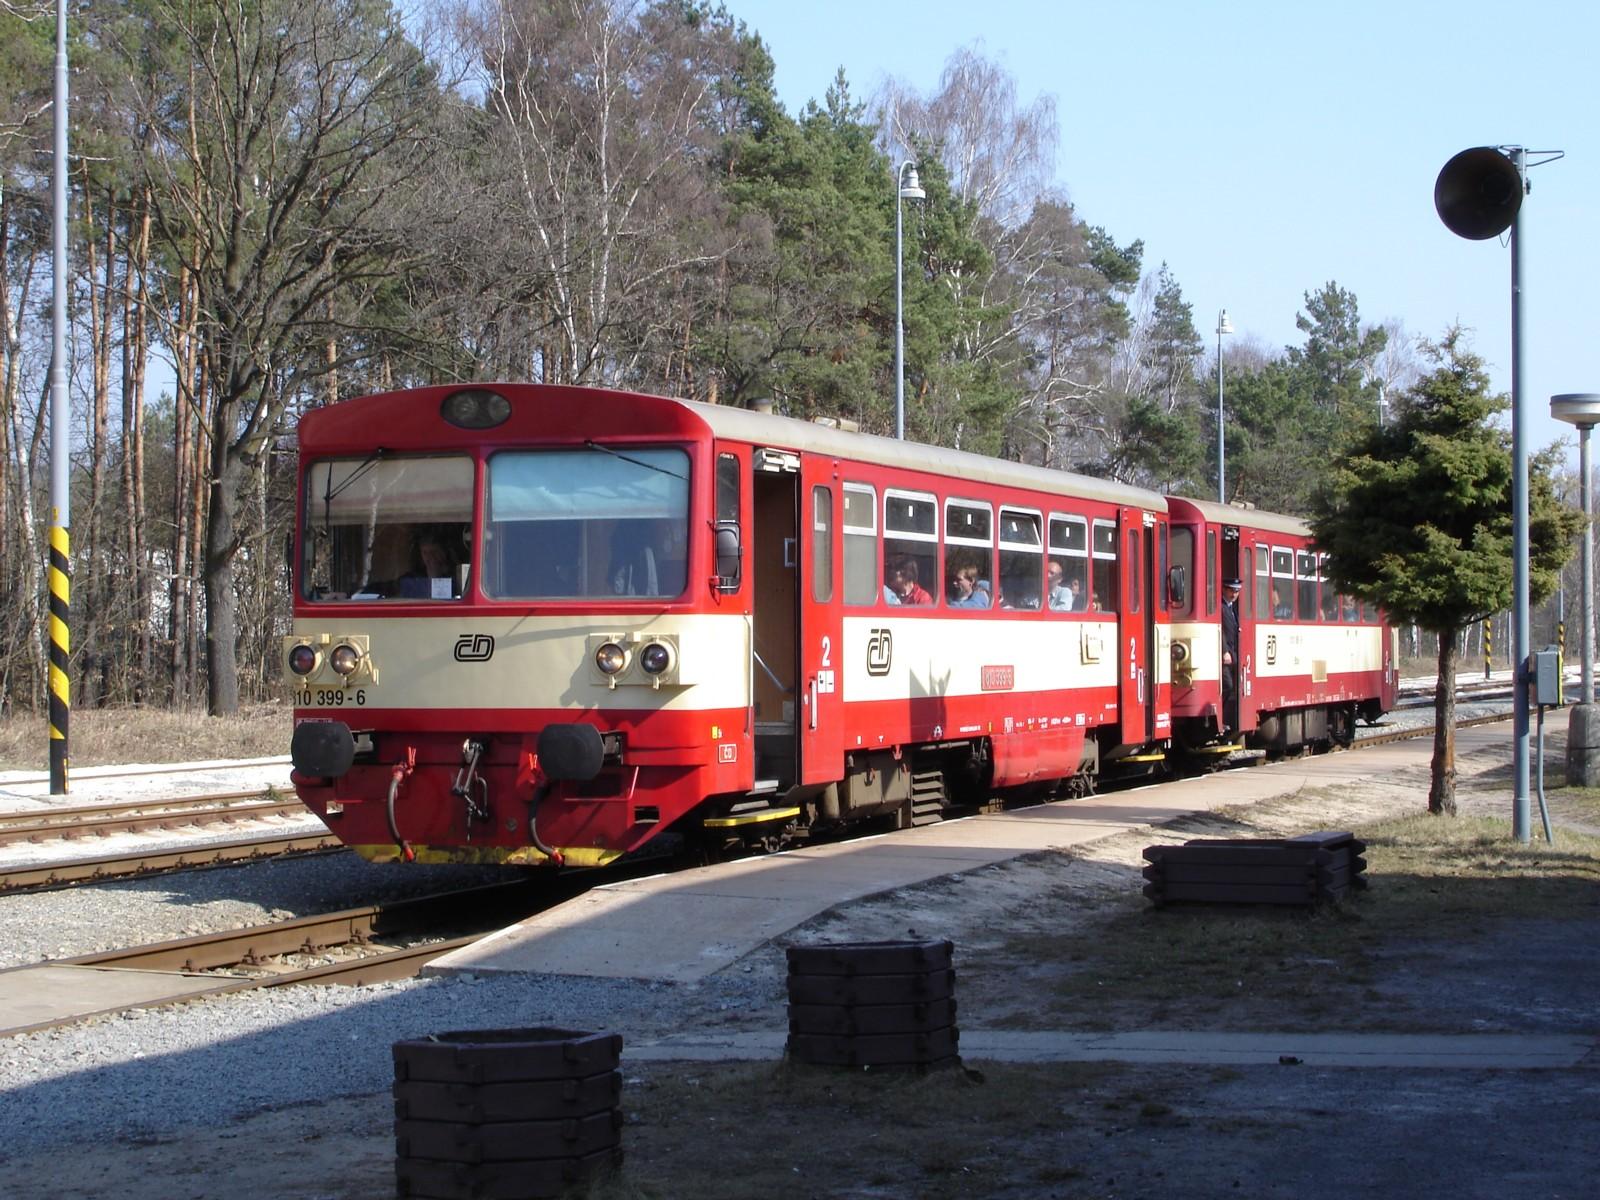 File:CSD Baureihe M 152.0.jpg - Wikimedia Commons